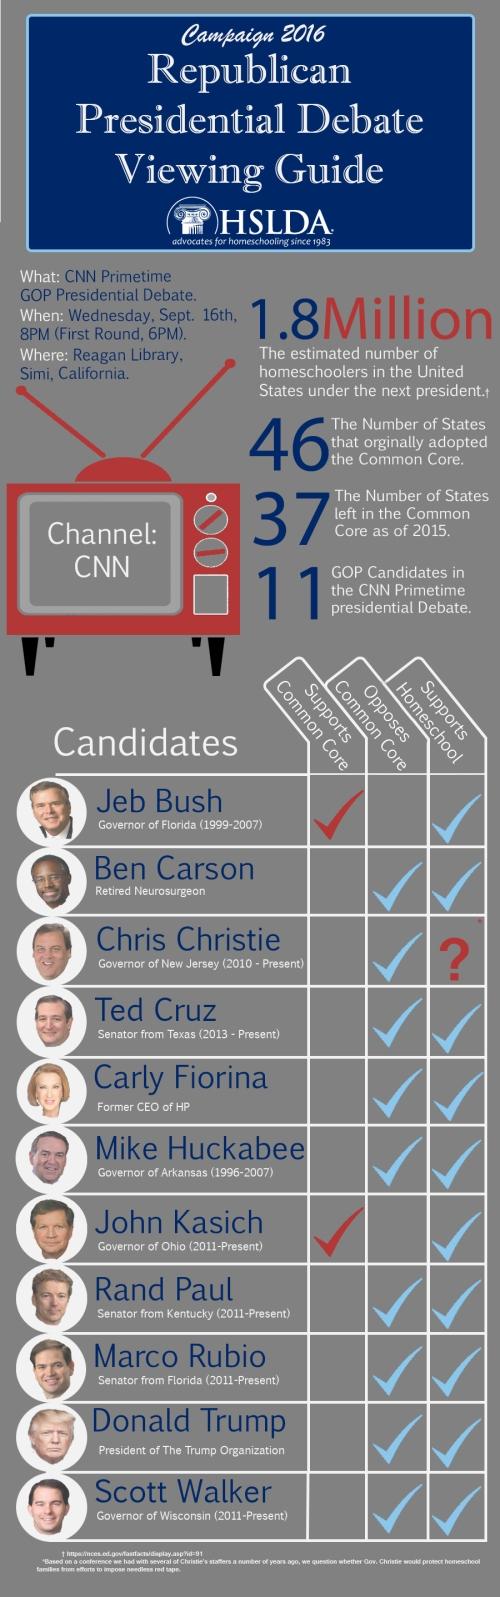 Republican Presidential Debate Viewing Guide | HSLDA Blog